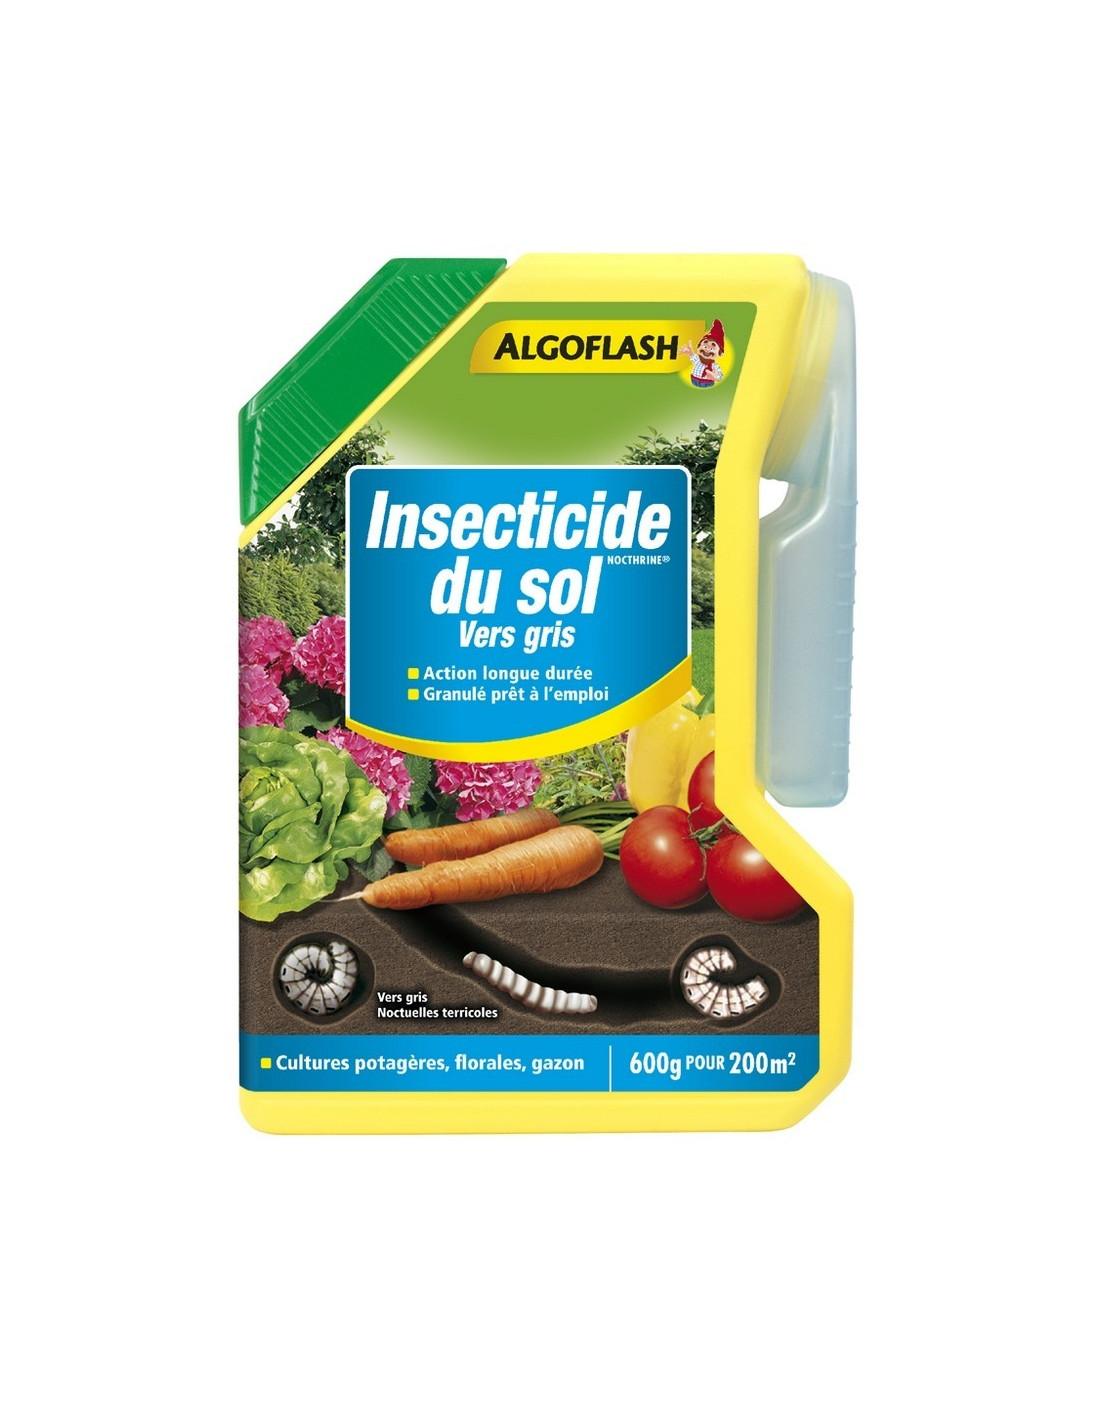 Algoflash naturasol insecticide du sol 600g hyper brico for Traitement vers du sol